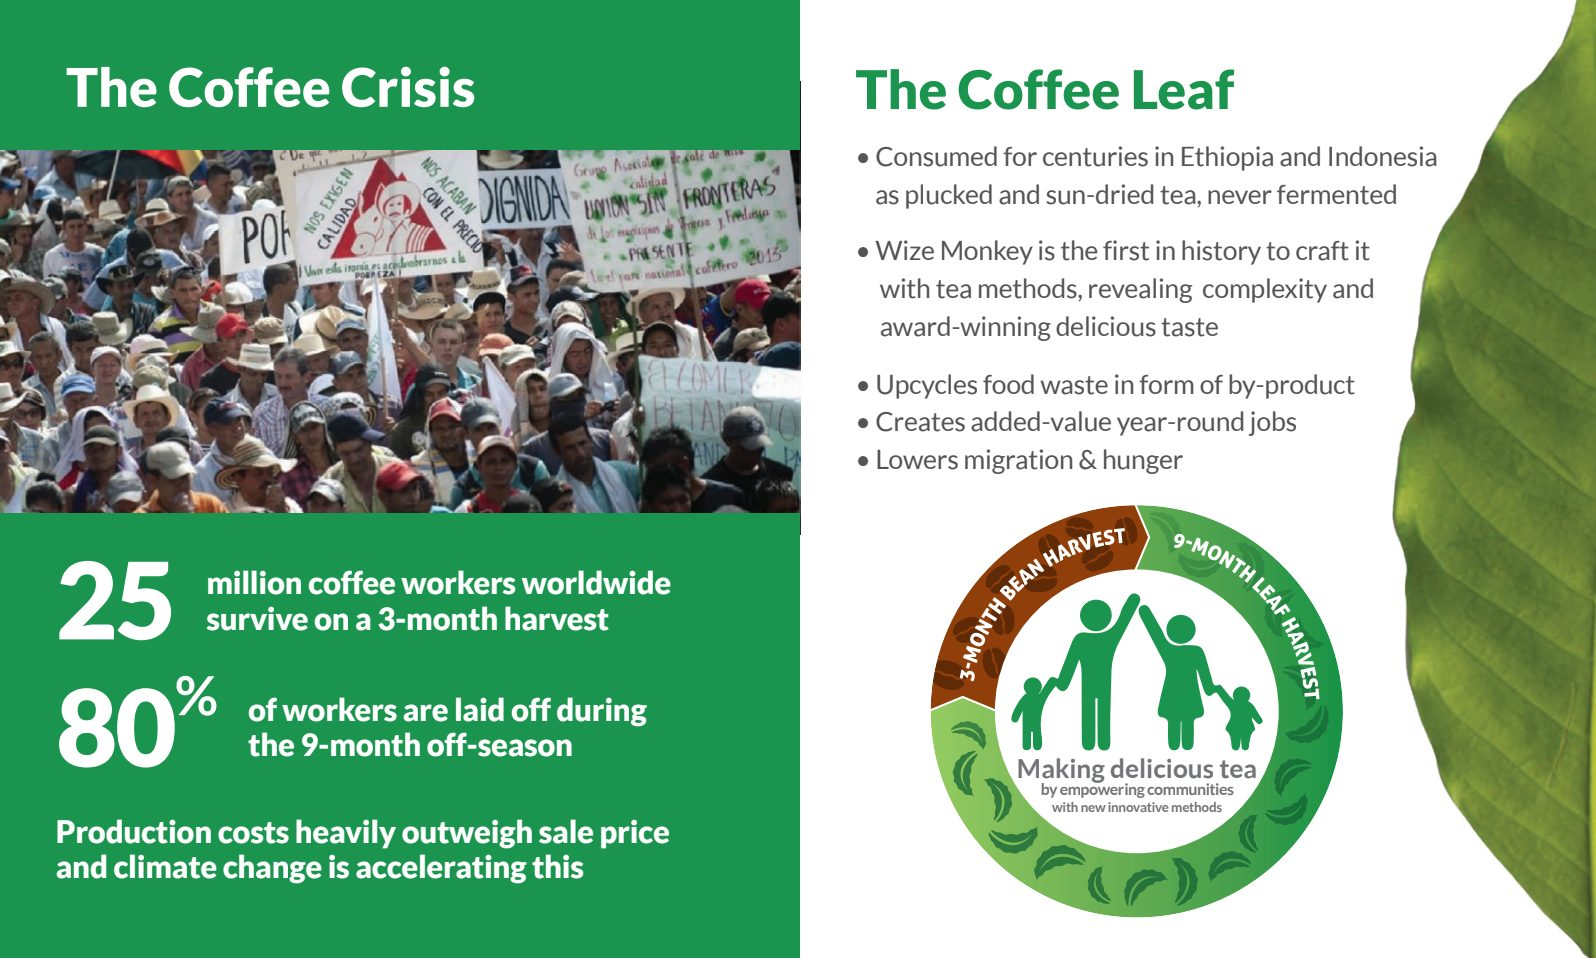 The Coffee Crisis